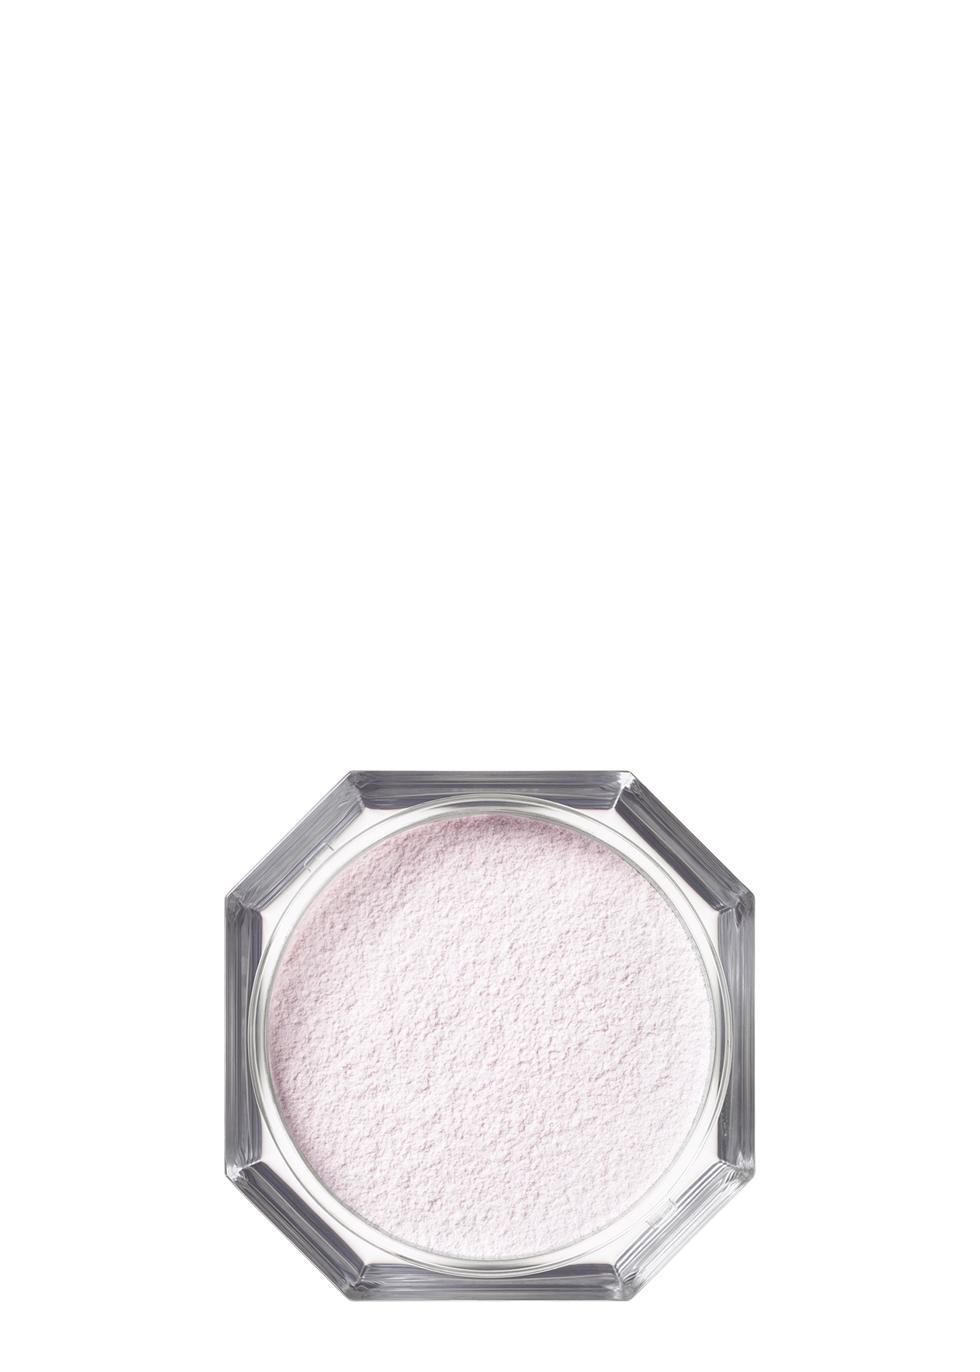 Pro Filt'r Instant Retouch Setting Powder - Lavender - FENTY BEAUTY